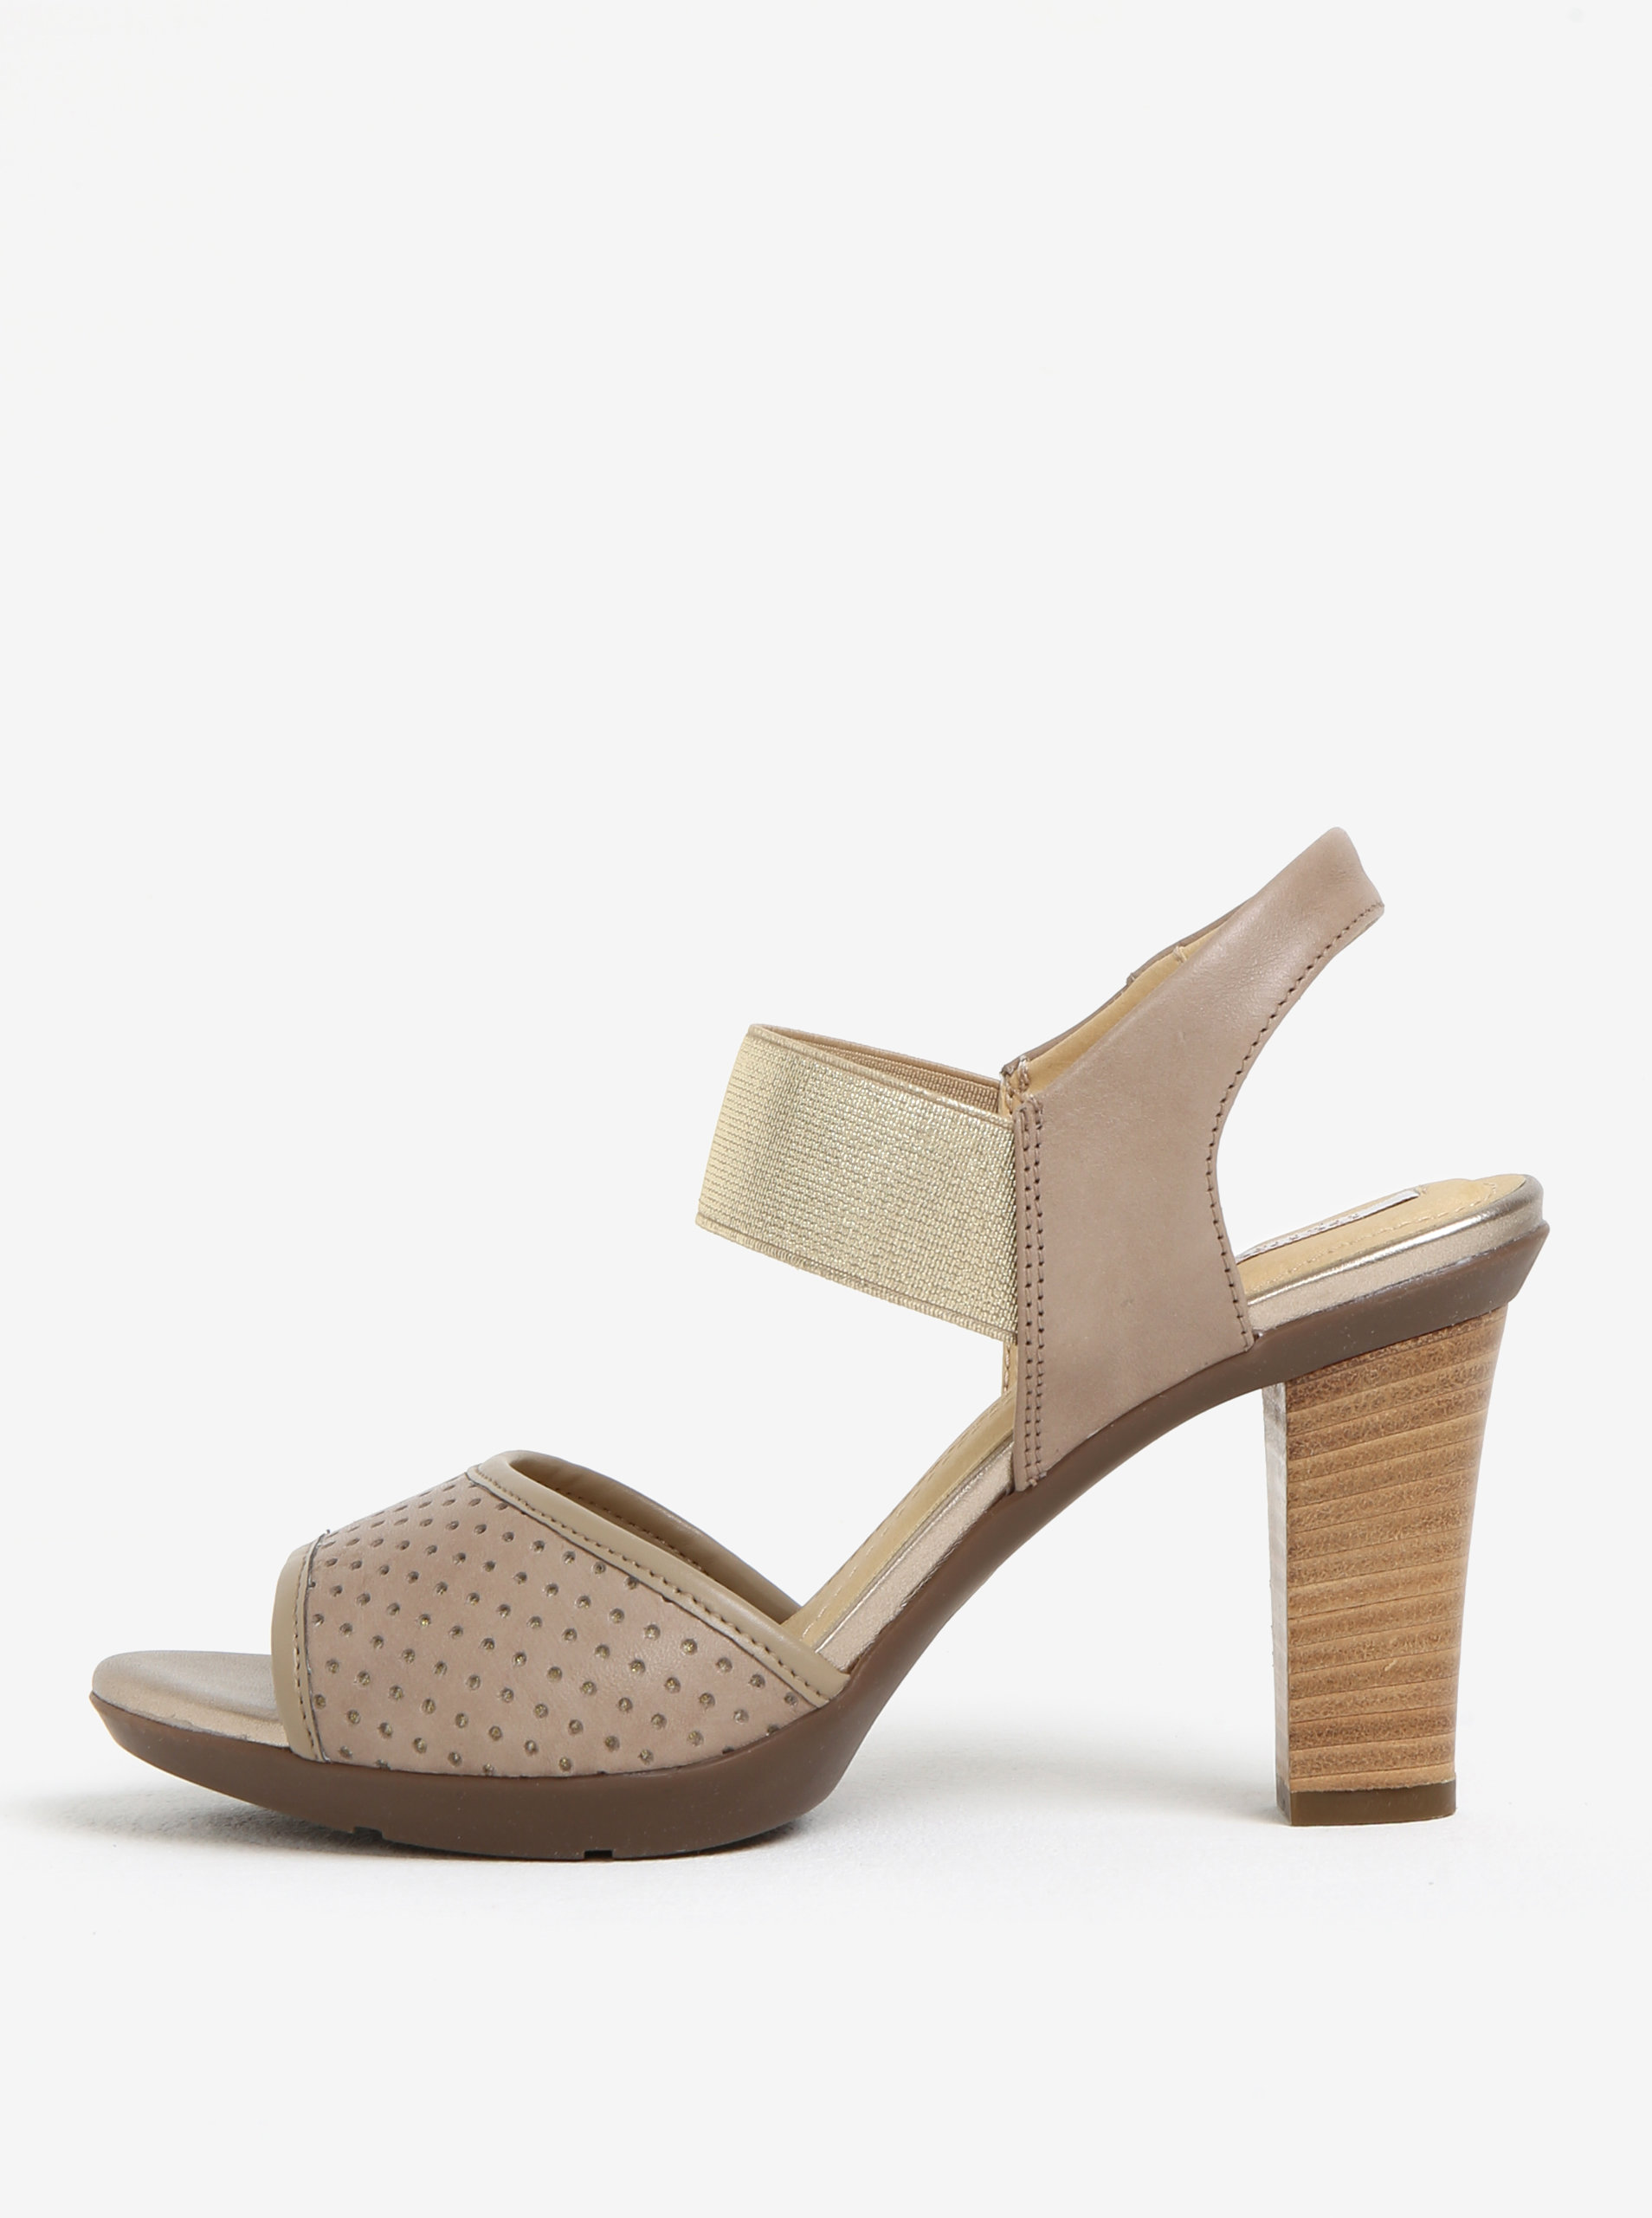 Béžové dámske kožené sandále na podpätku Geox Jadalis ... c879751efa3